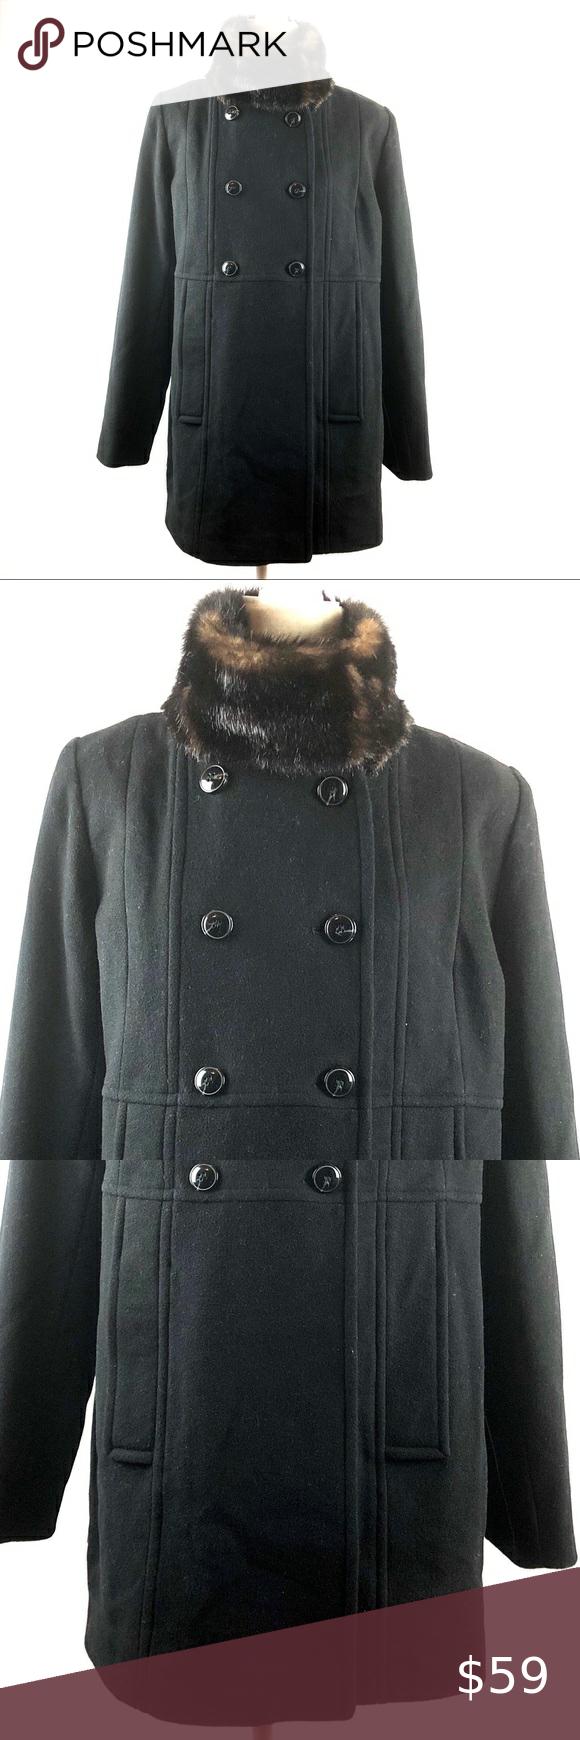 Centigrade Vintage Wool Fur Double Breasted Coat Centigrade Outerwear Vintage Black Wool Faux Fur Trim Do Faux Fur Trim Coat Double Breasted Coat Fur Trim Coat [ 1740 x 580 Pixel ]